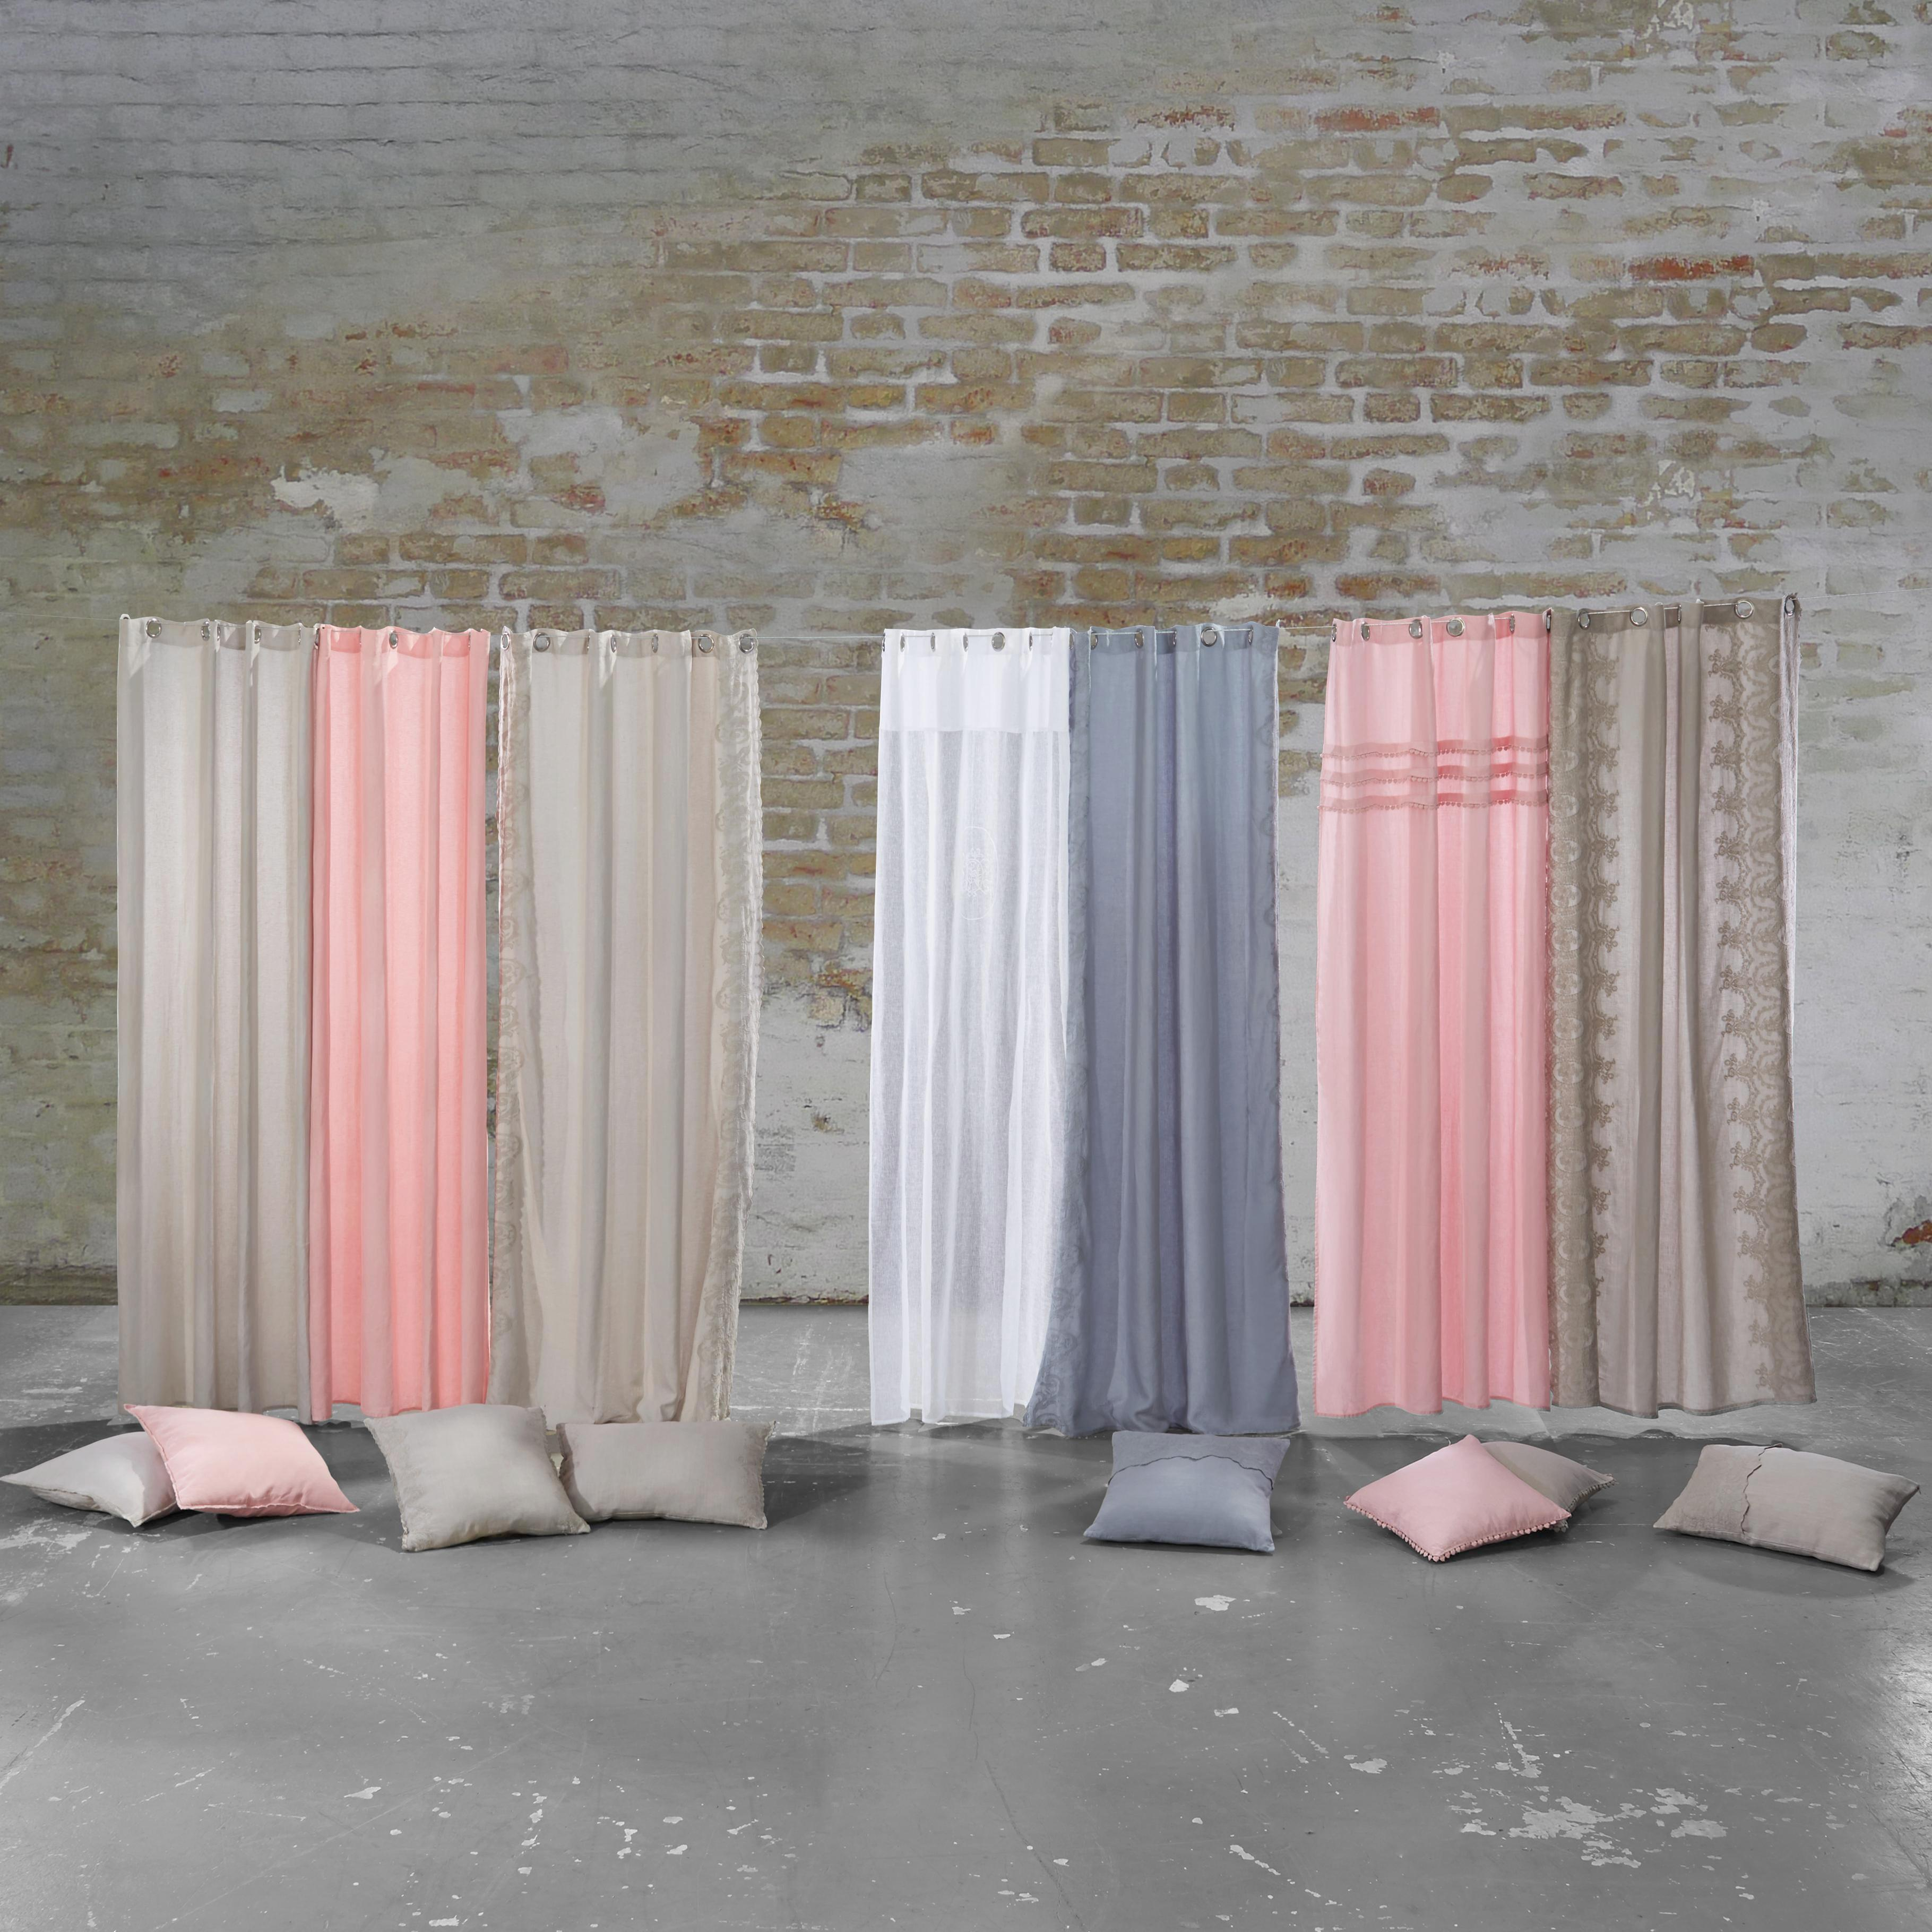 Baumwollvorhang Amalie 140x245cm - Weiß, ROMANTIK / LANDHAUS, Textil (140/245cm) - MÖMAX modern living